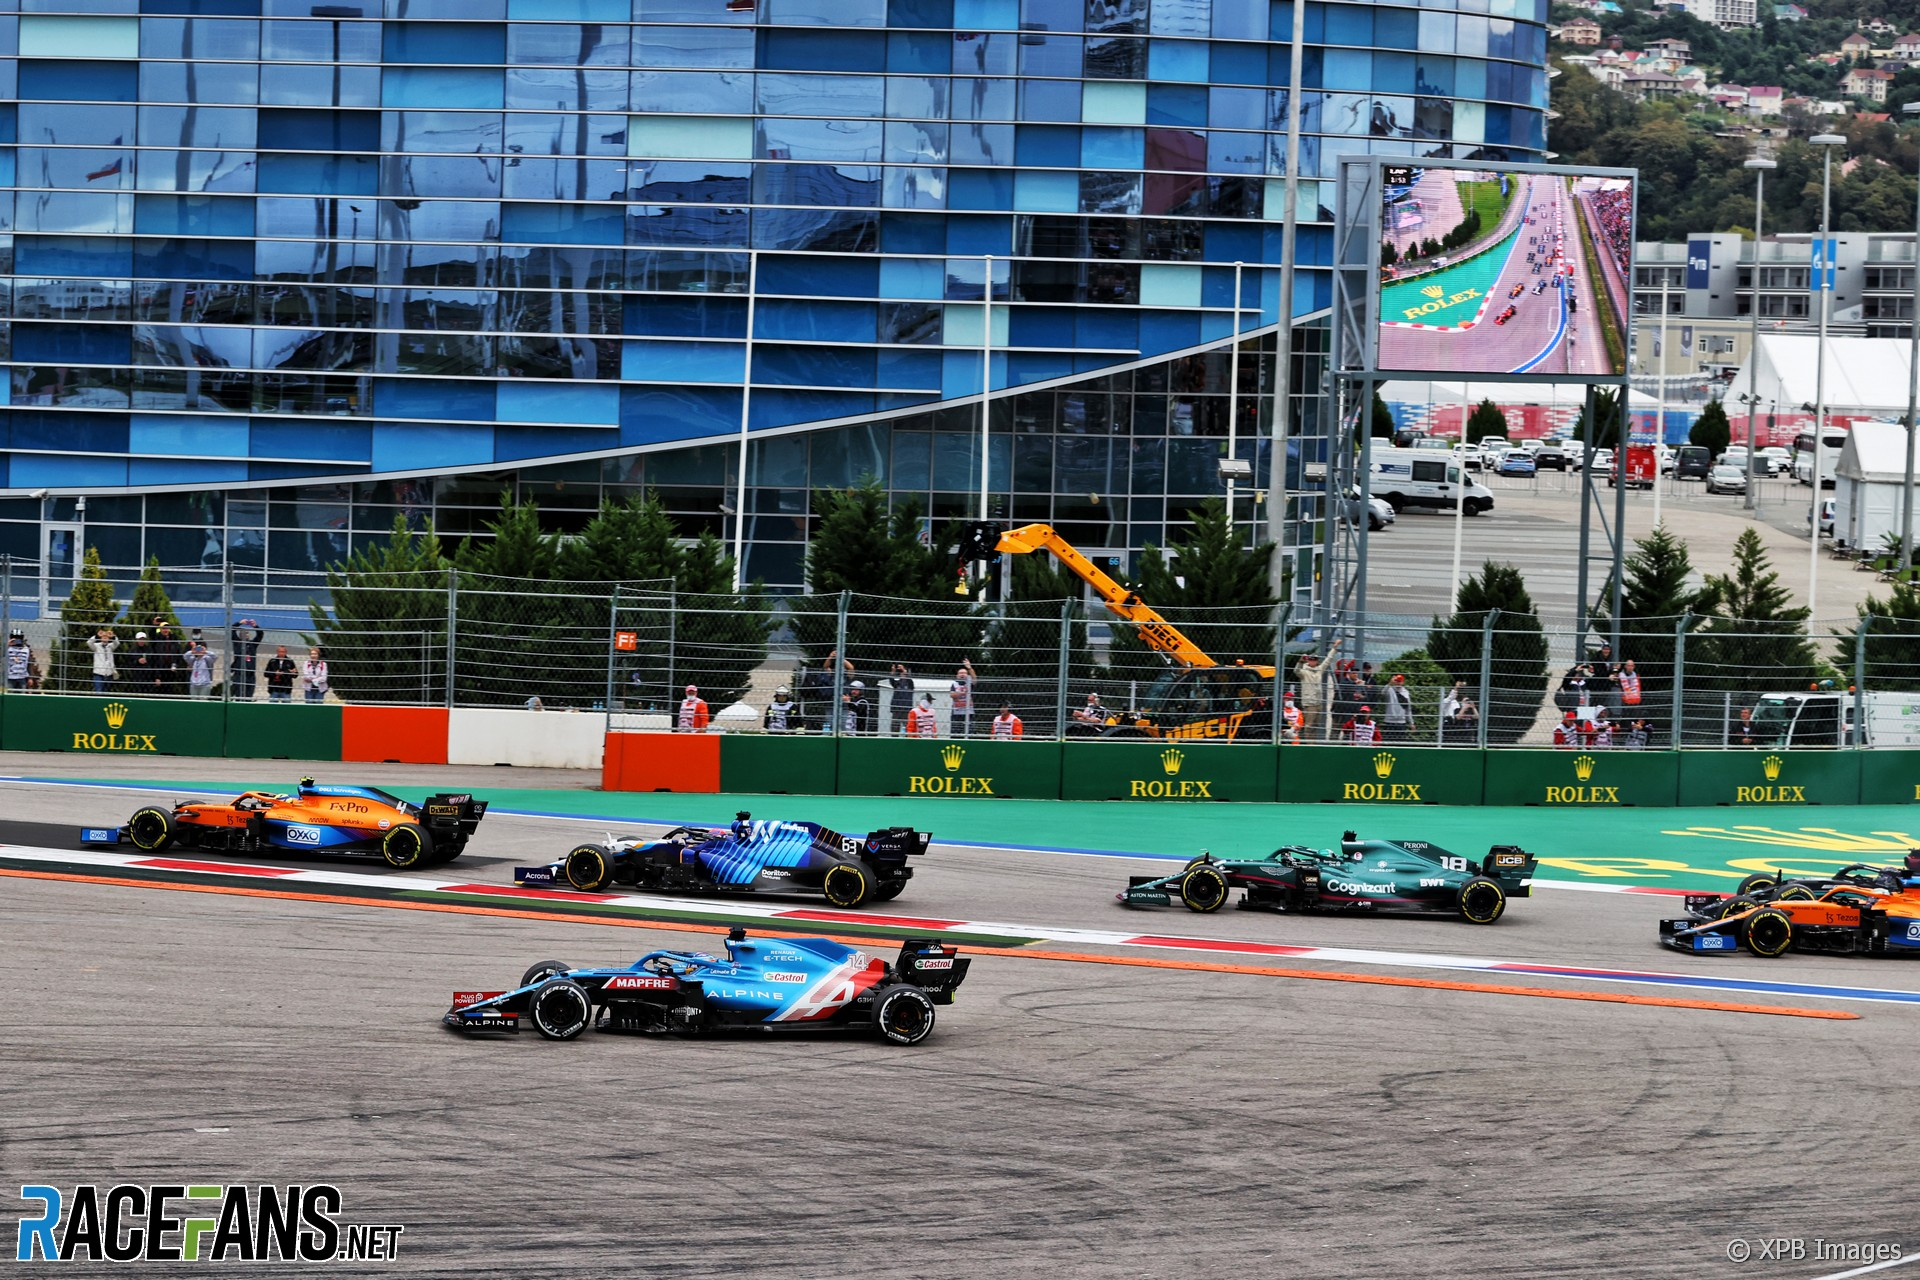 Fernando Alonso, Alpine, Sochi Autodrom, 2021